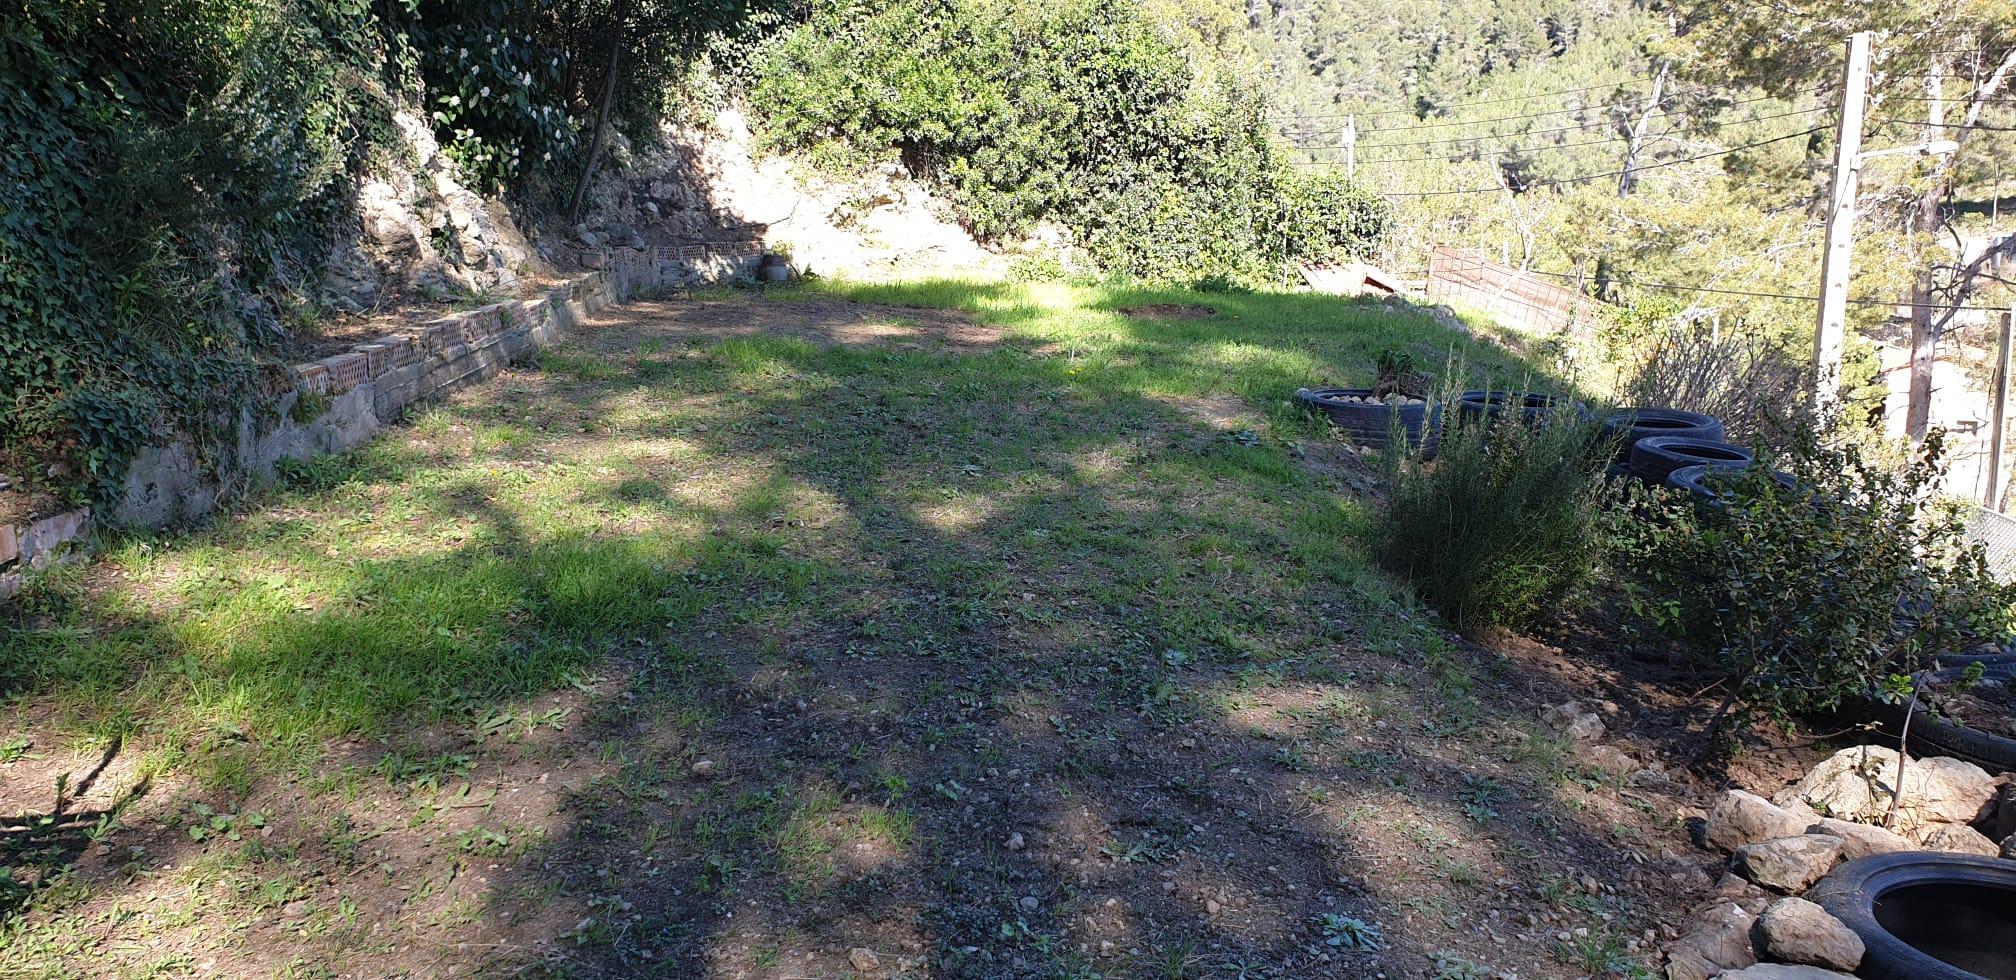 Terreno en Pinatella en VALLIRANA en Venta por 57.000€